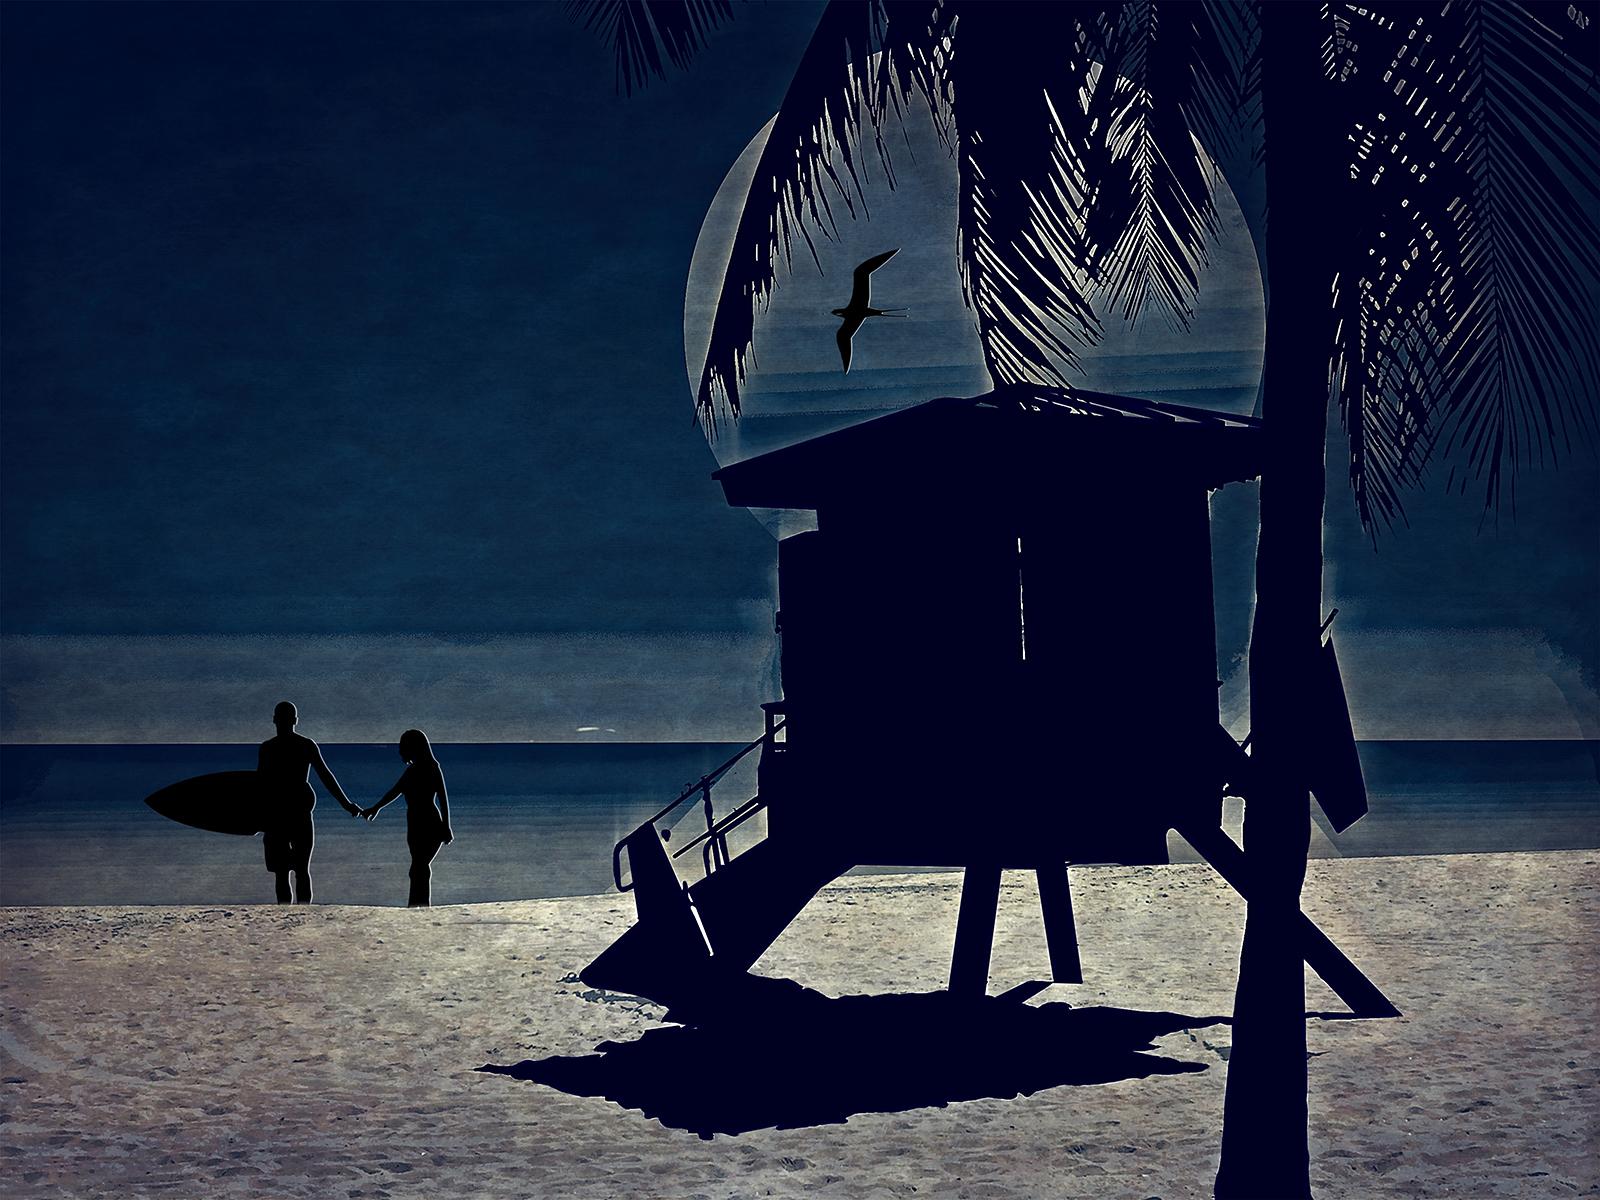 0569 Ft Lauderdale Lifeguard Hut